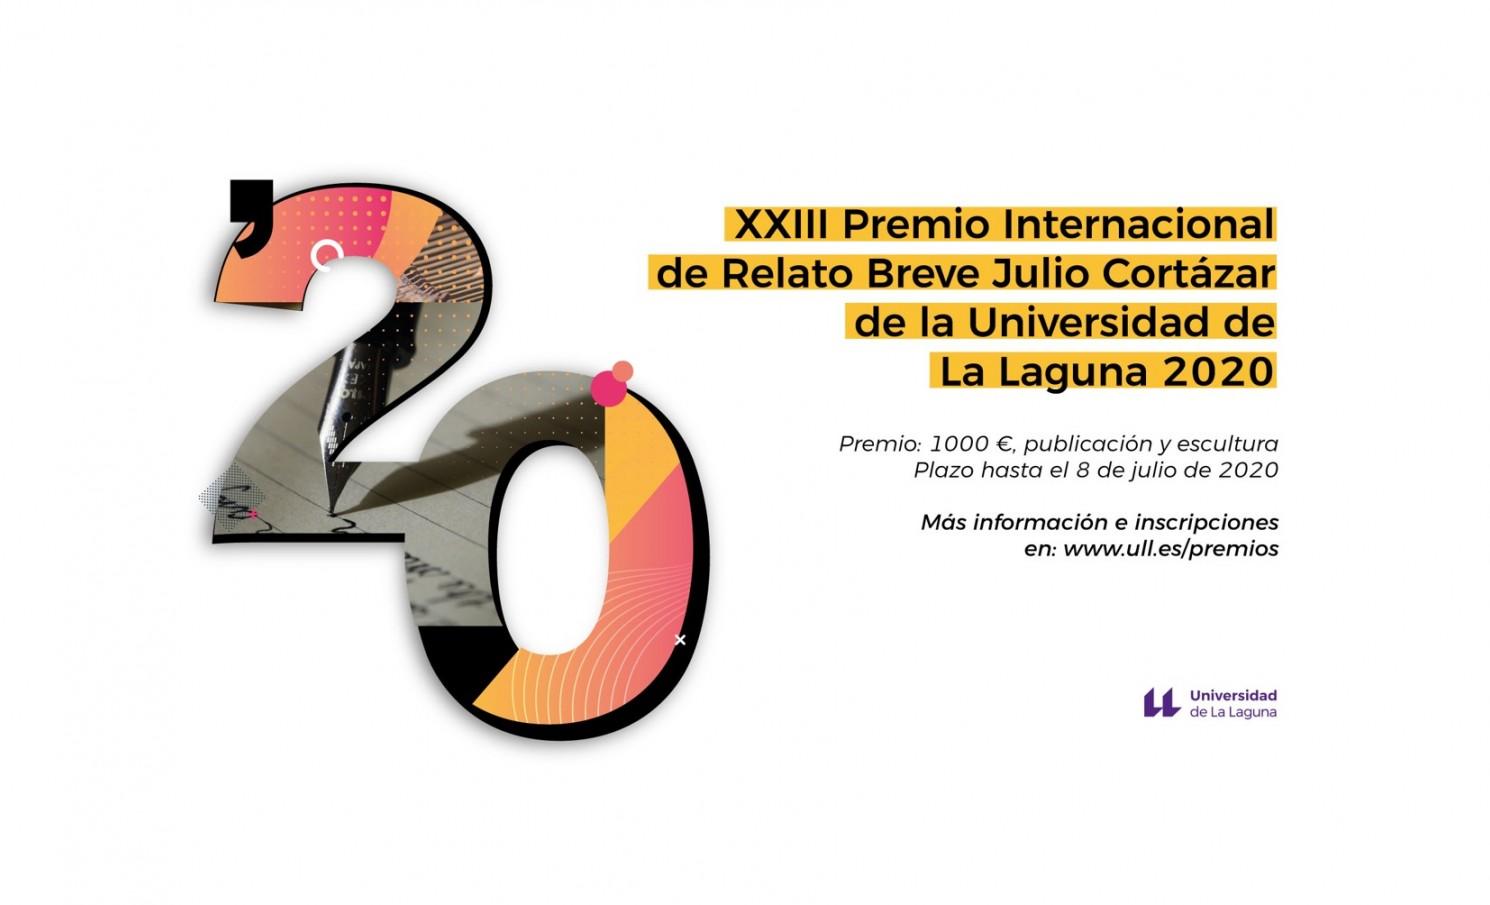 XXIII PREMIO INTERNACIONAL JULIO CORTÁZAR DE RELATO BREVE  DE LA UNIVERSIDAD DE LA LAGUNA 2020